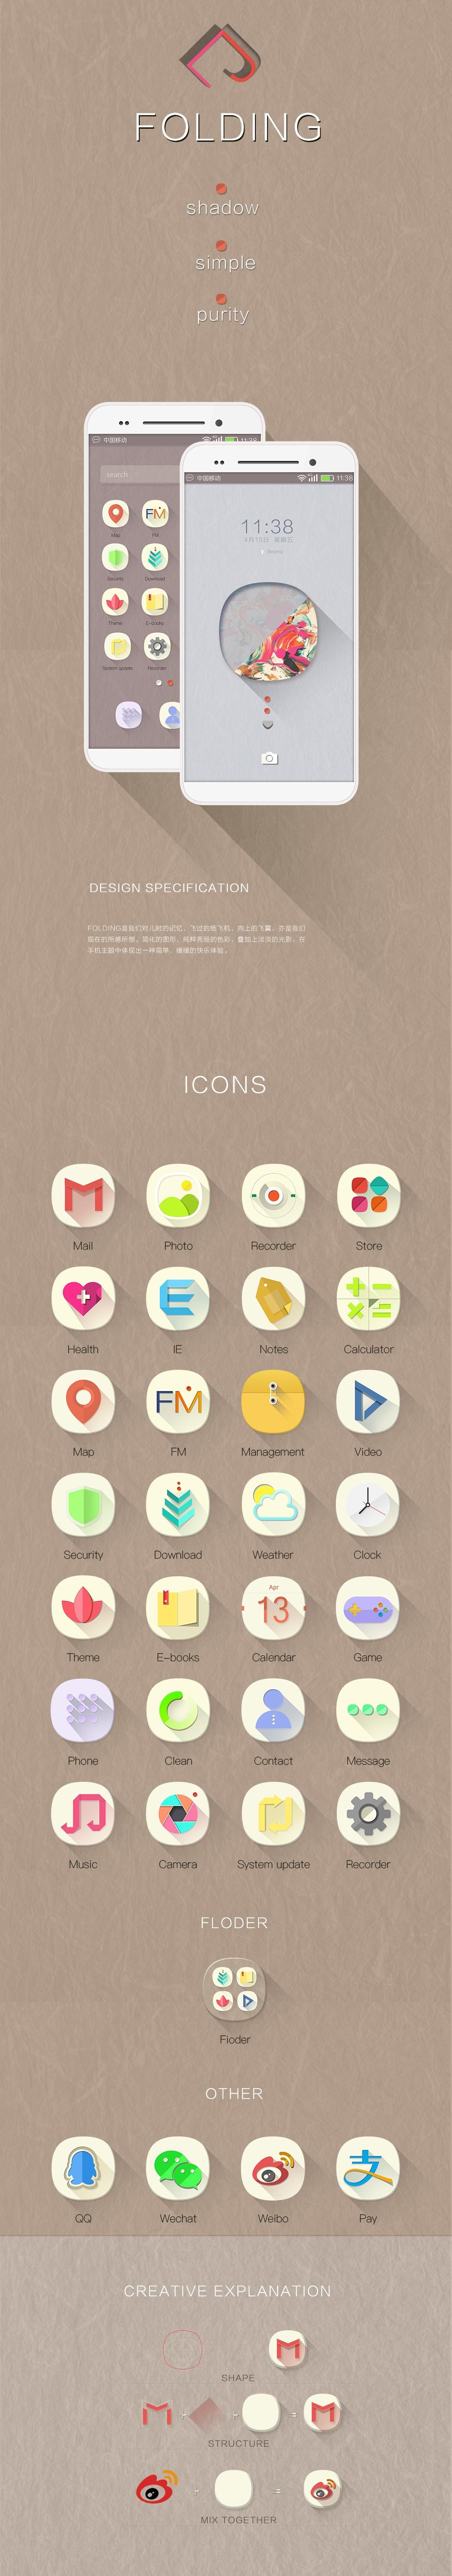 icon 扁平设计 手机主题设计 floding 时光穿梭机